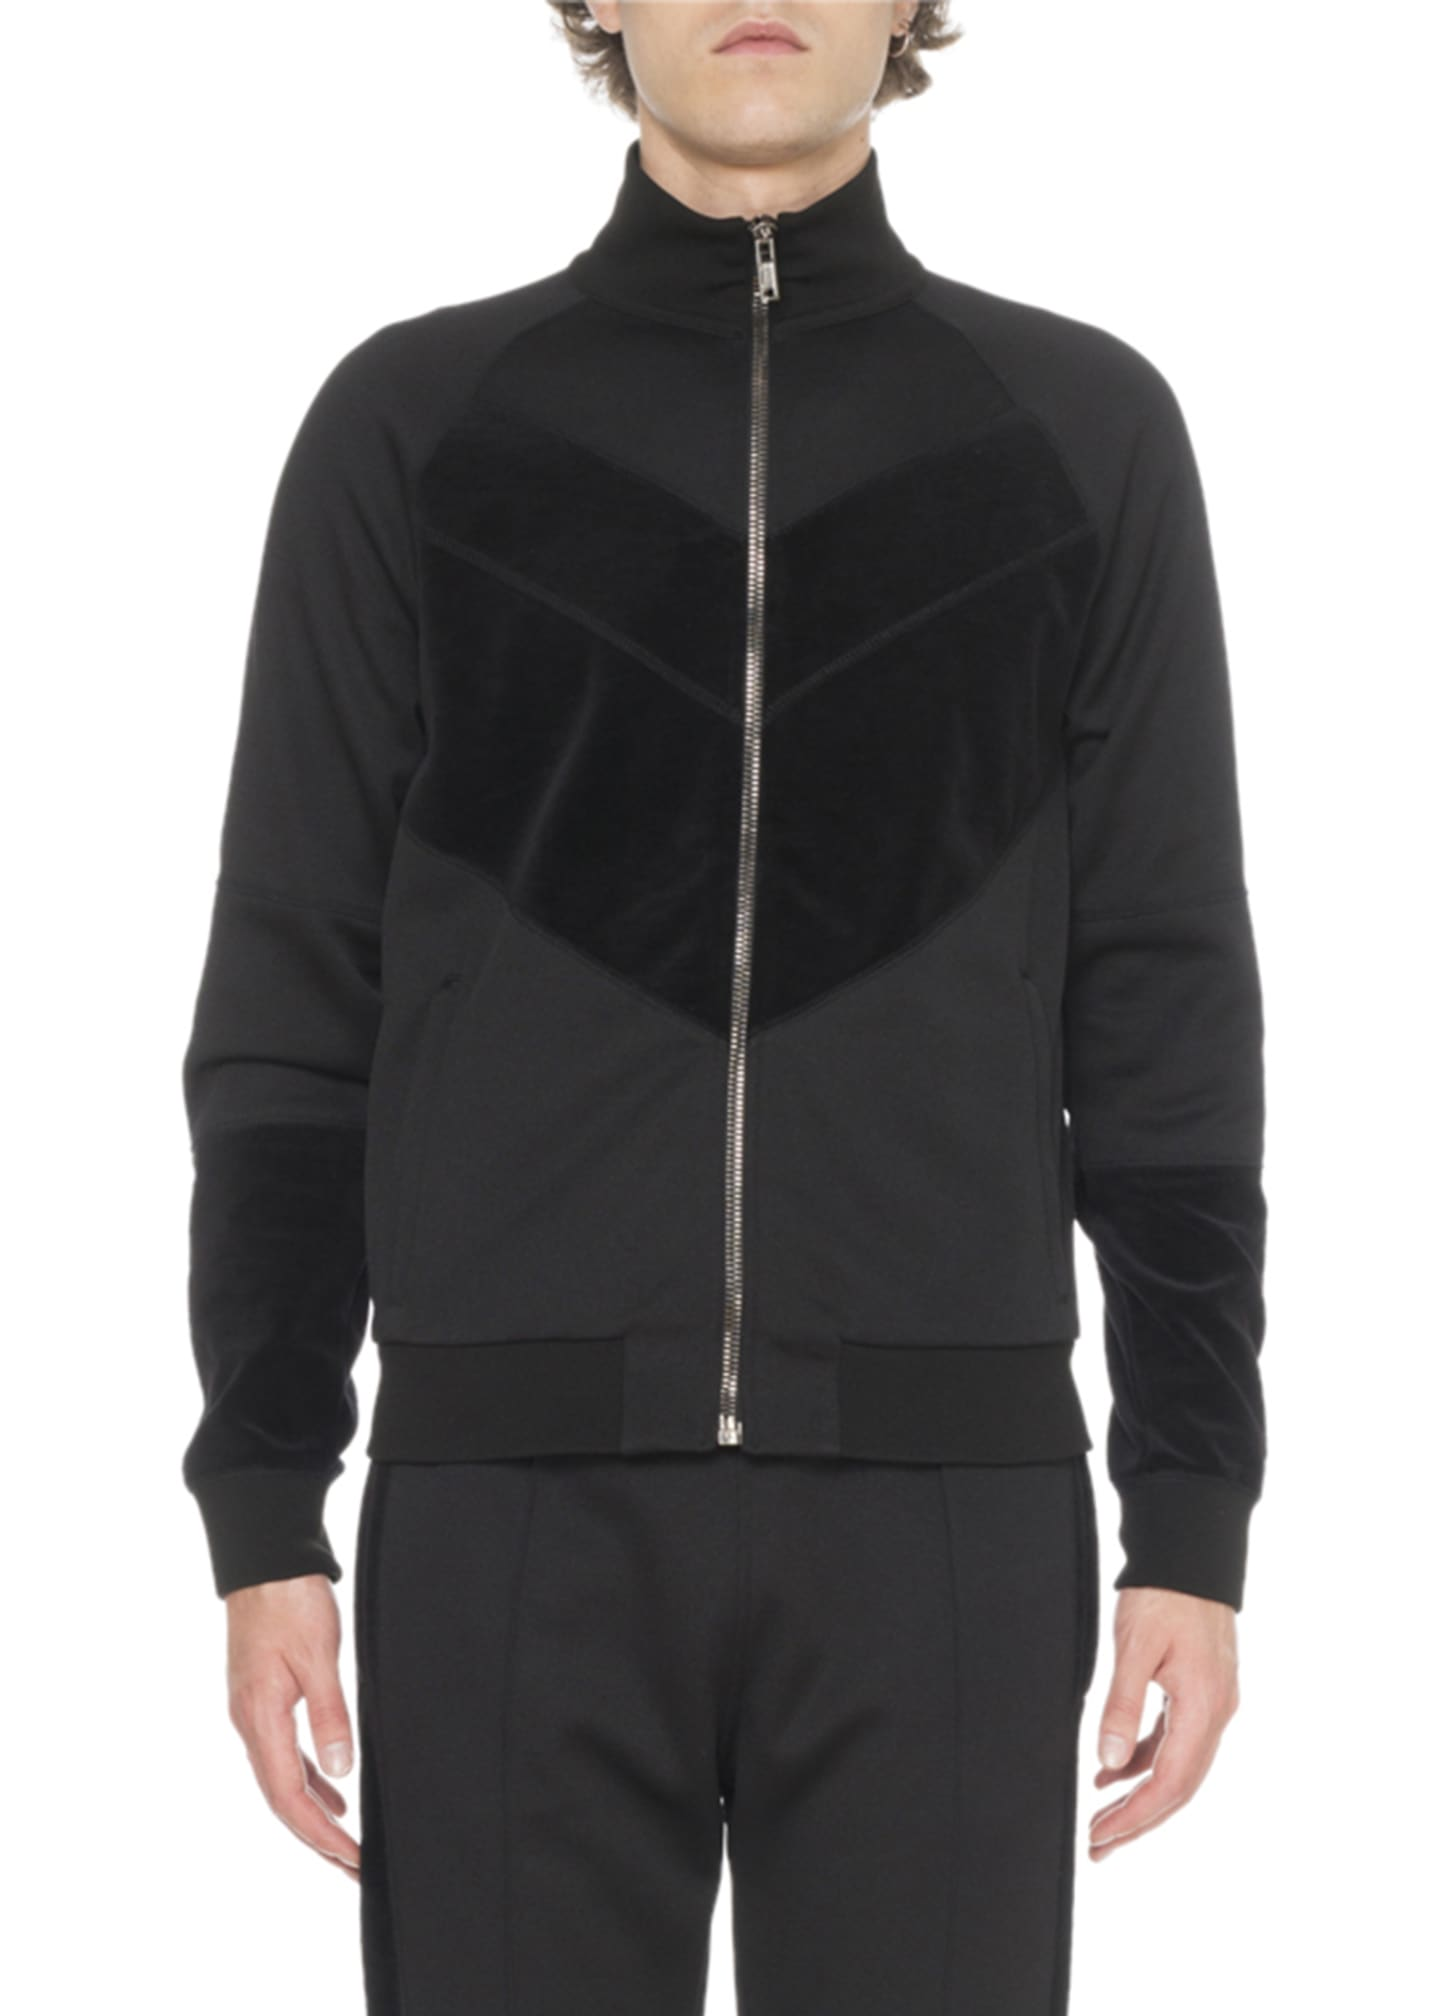 Givenchy Men's Velvet Track Jacket